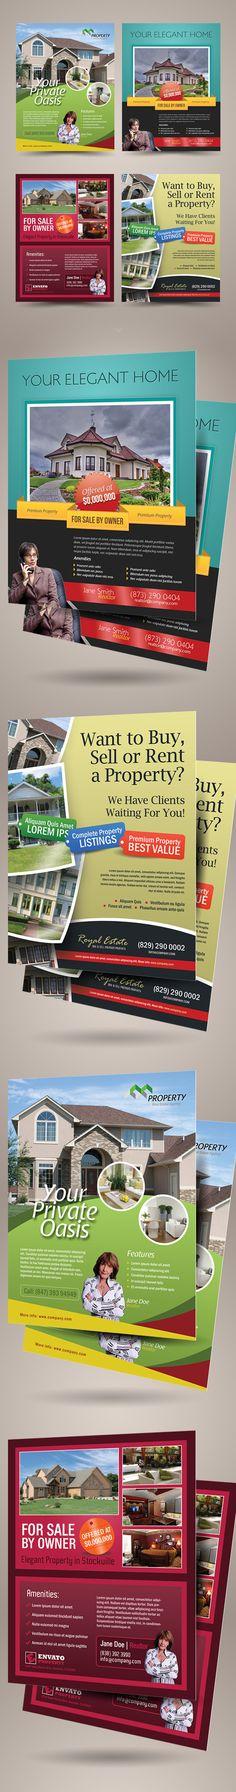 Premium Real Estate Flyer Templates by Kinzi Wijaya, via Behance